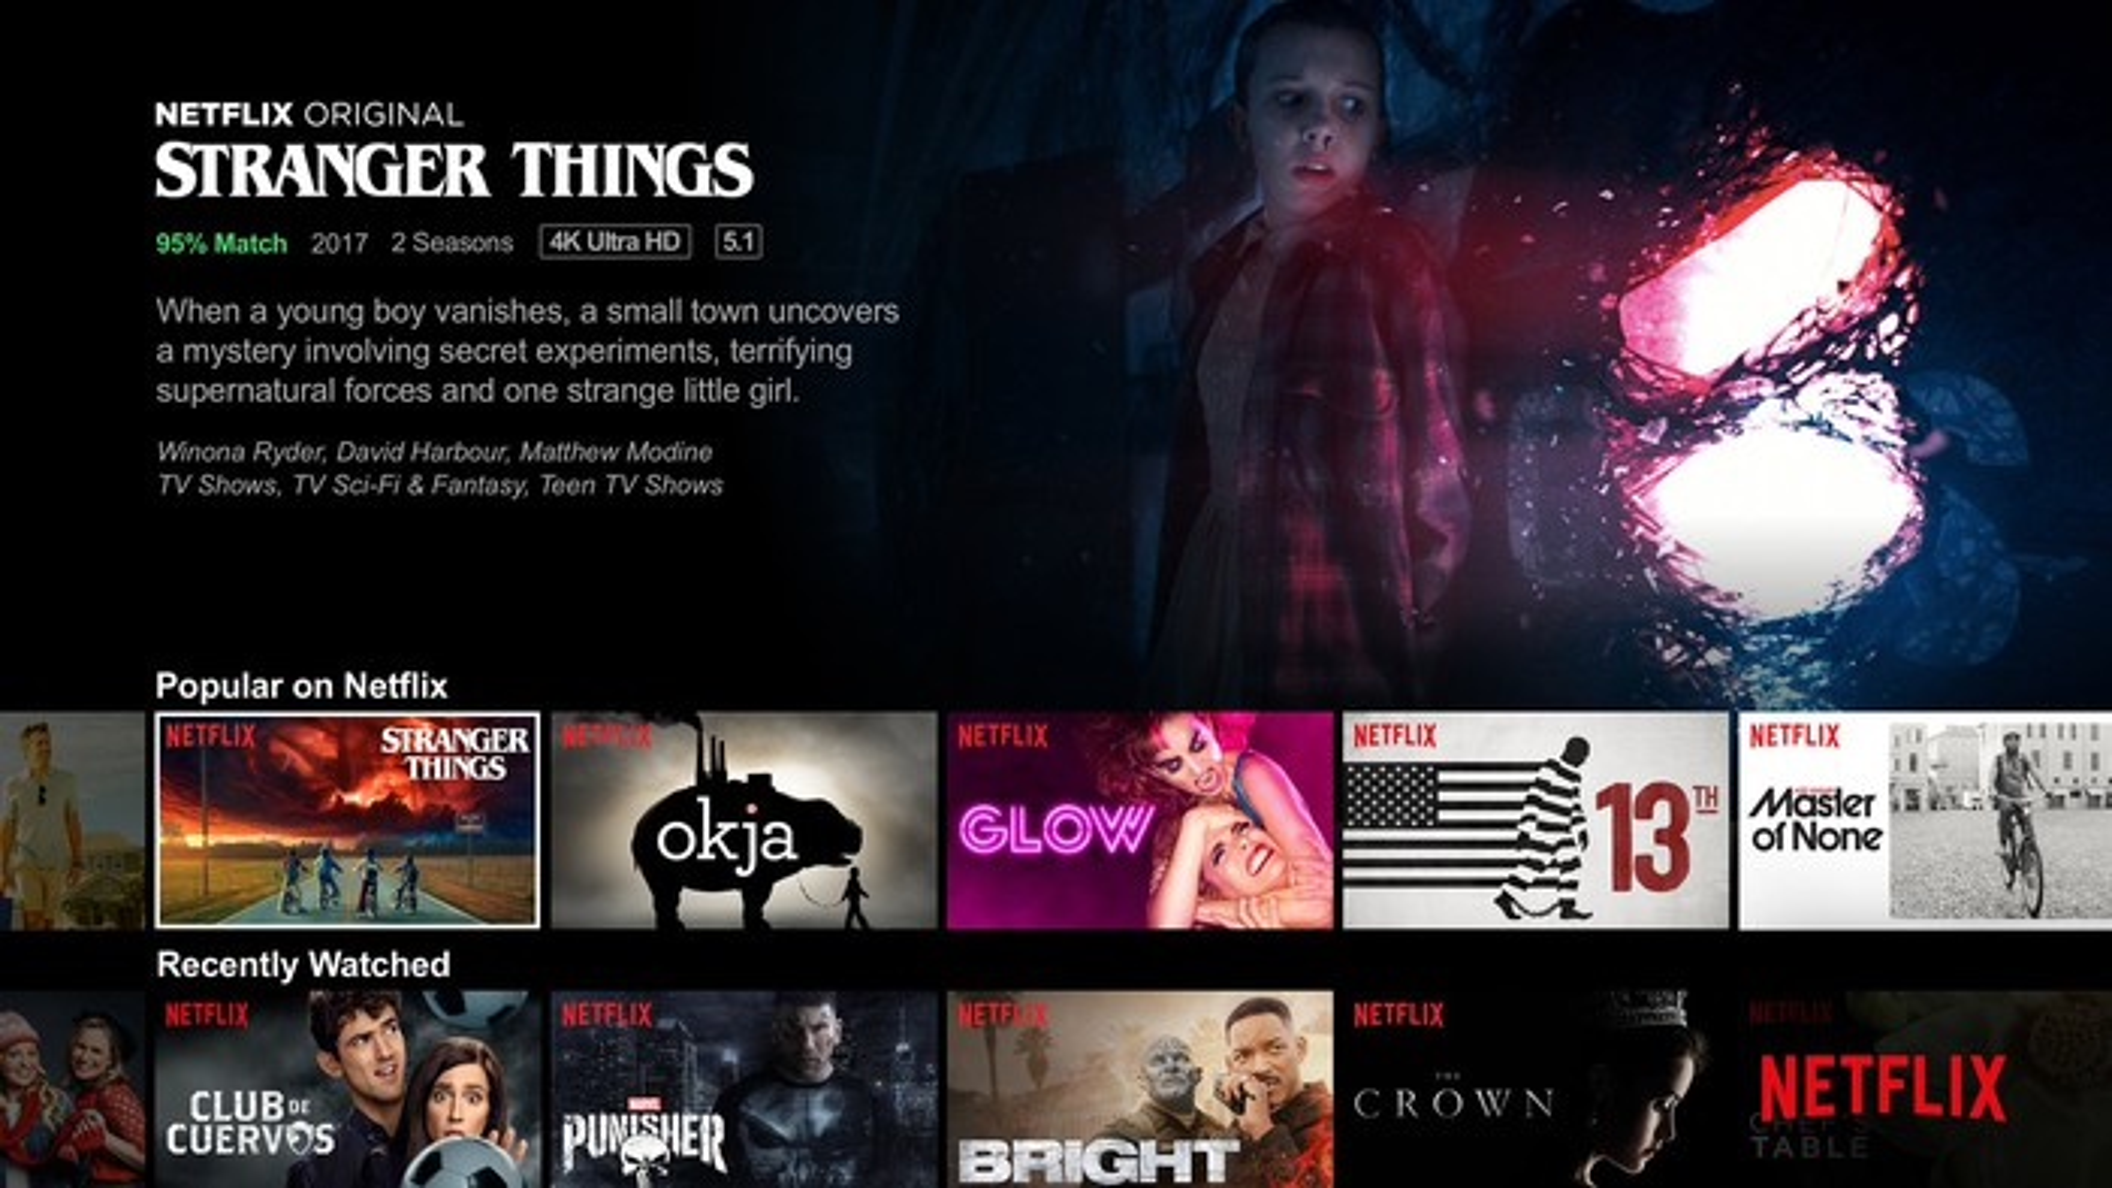 Netflix landing page featuring Stranger Things.